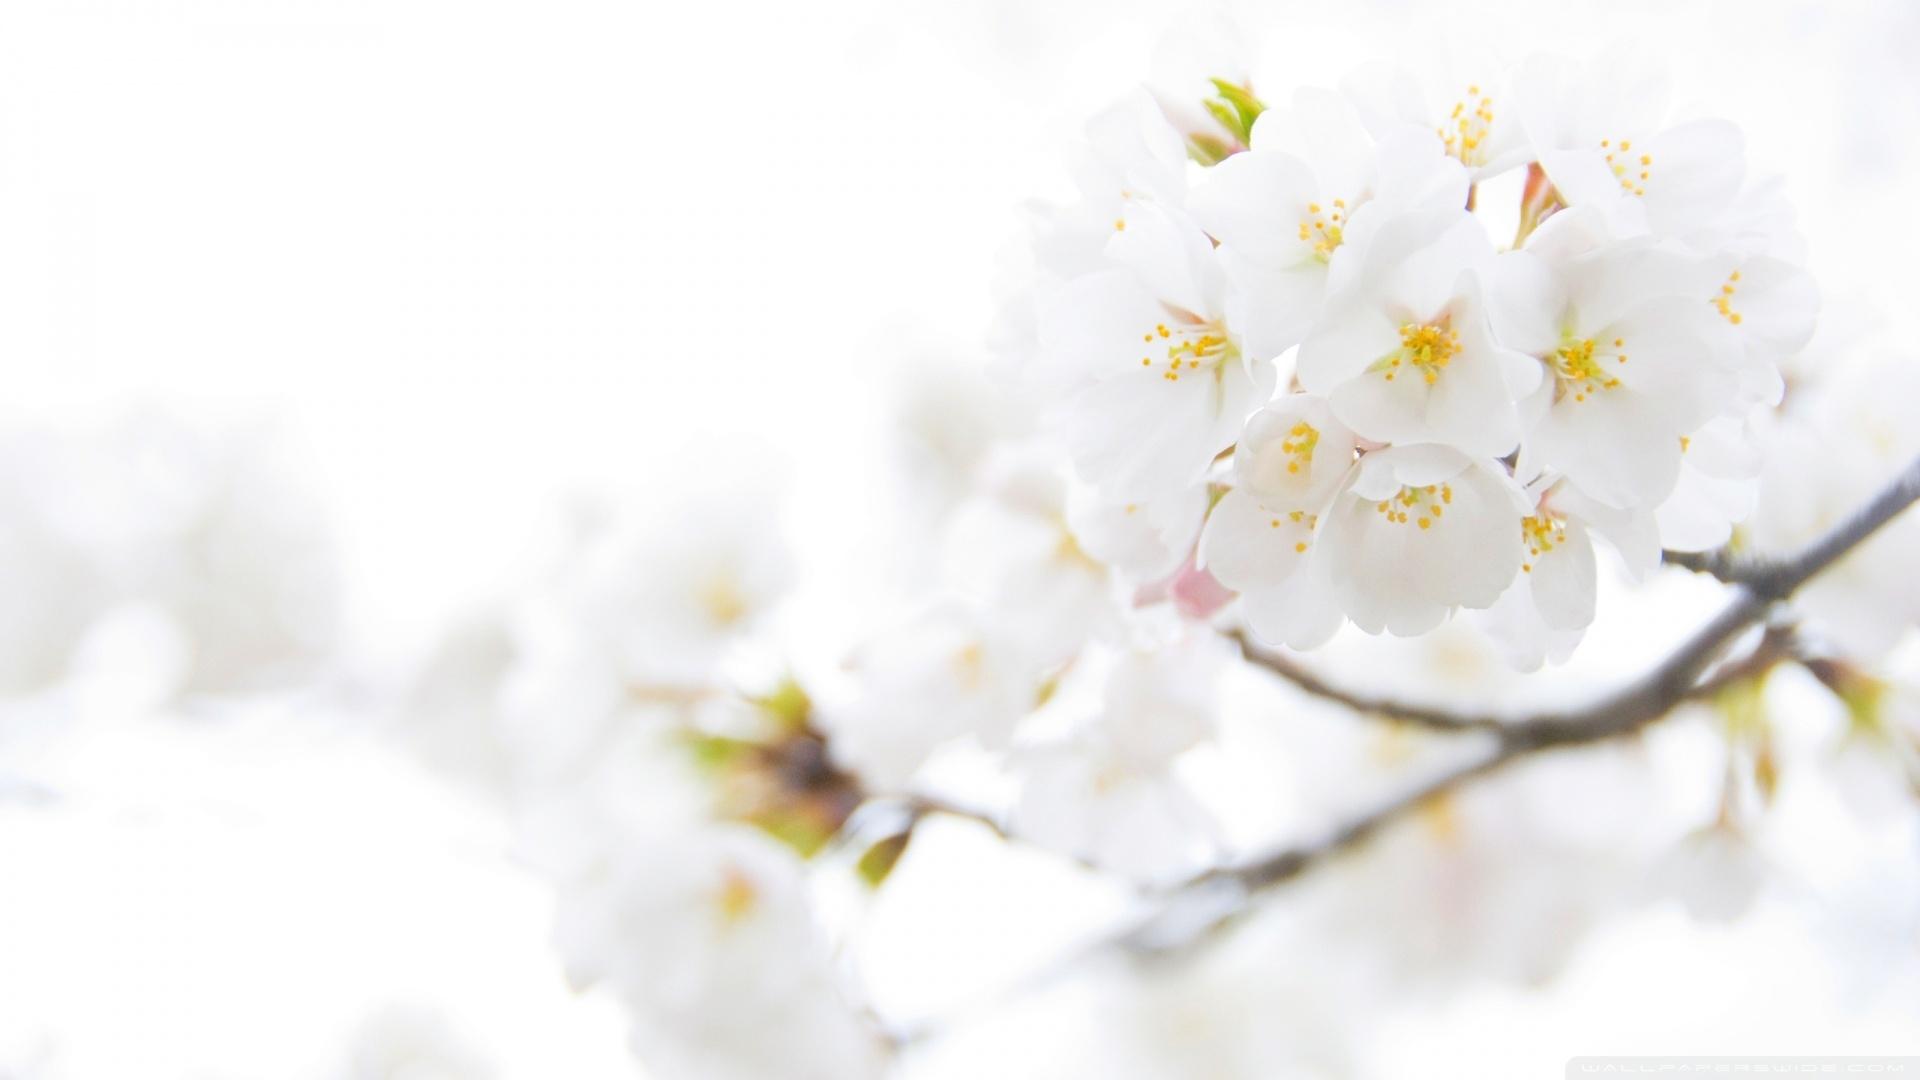 white flower image  wallpaper hd, Beautiful flower